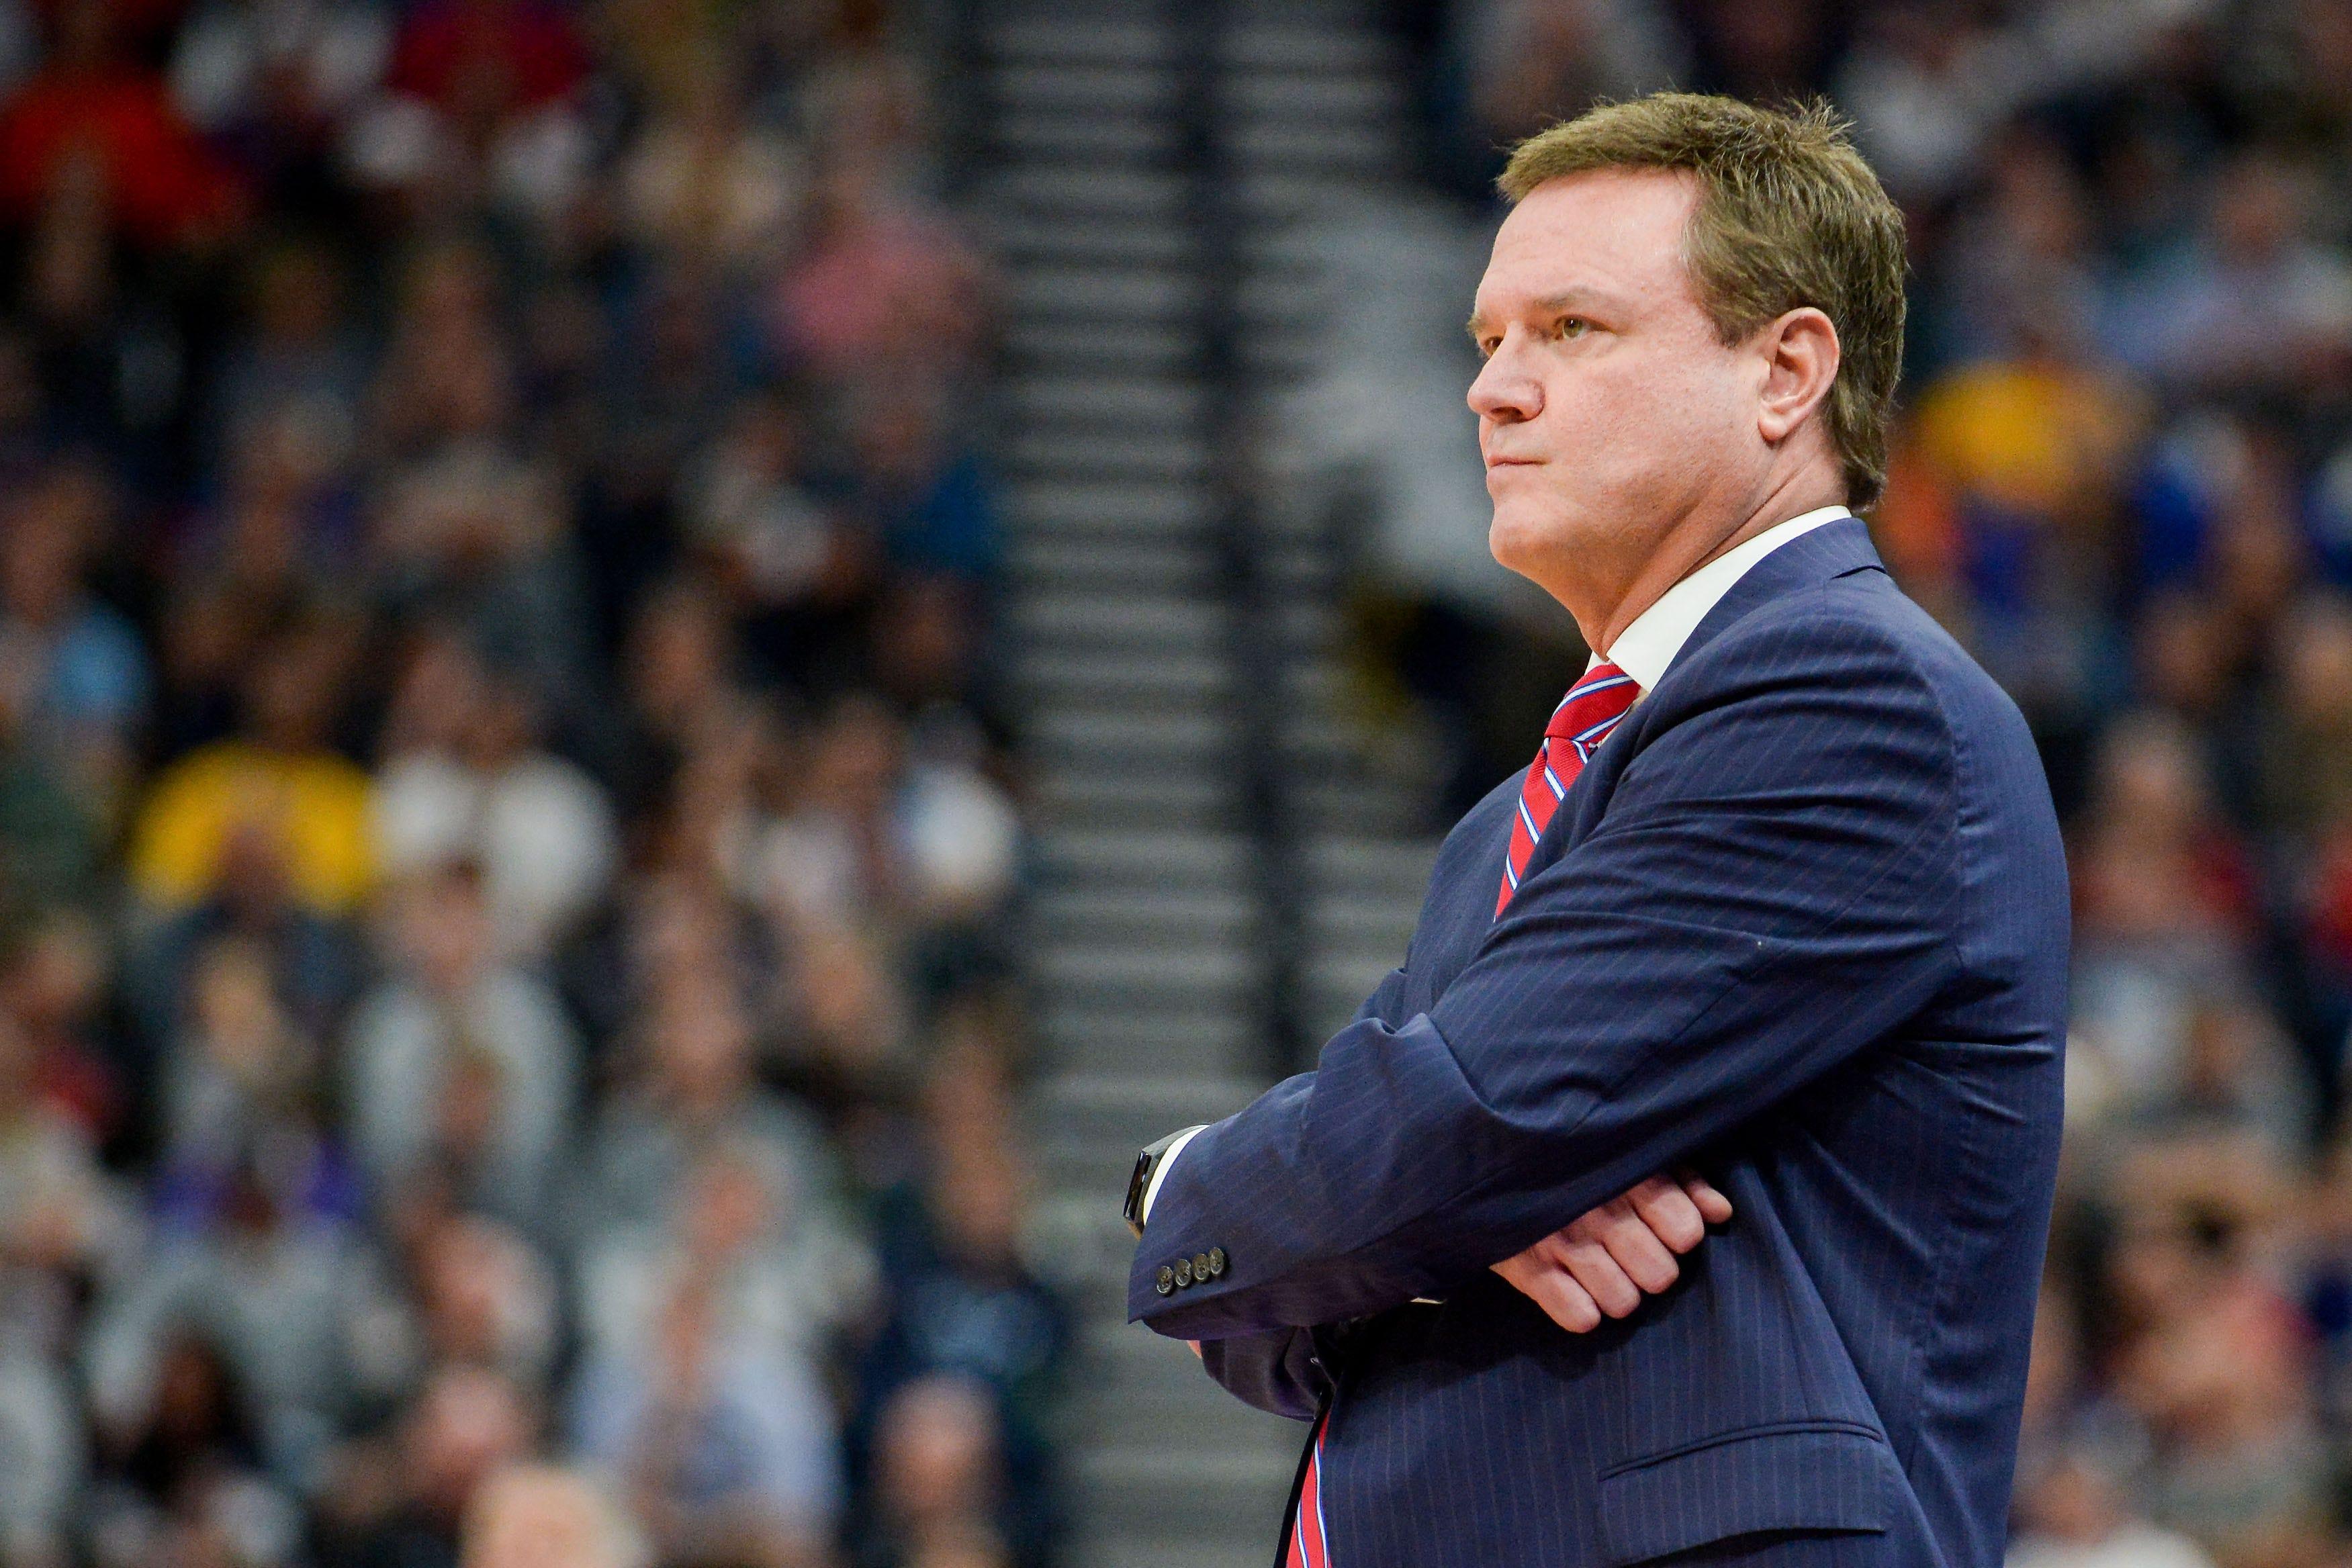 Bill Self, Kansas to fight NCAA allegations against basketball program